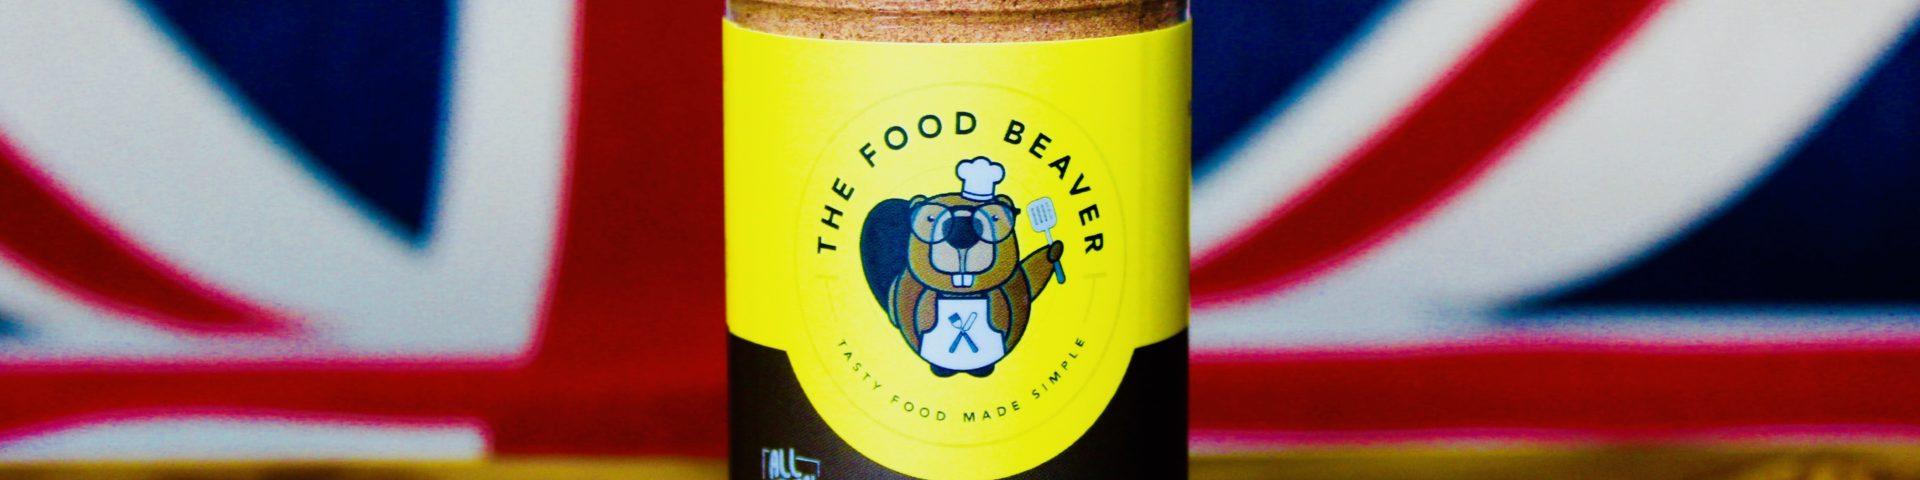 The Food Beaver BBQ Seasoning & Marinade - All natural ingredients